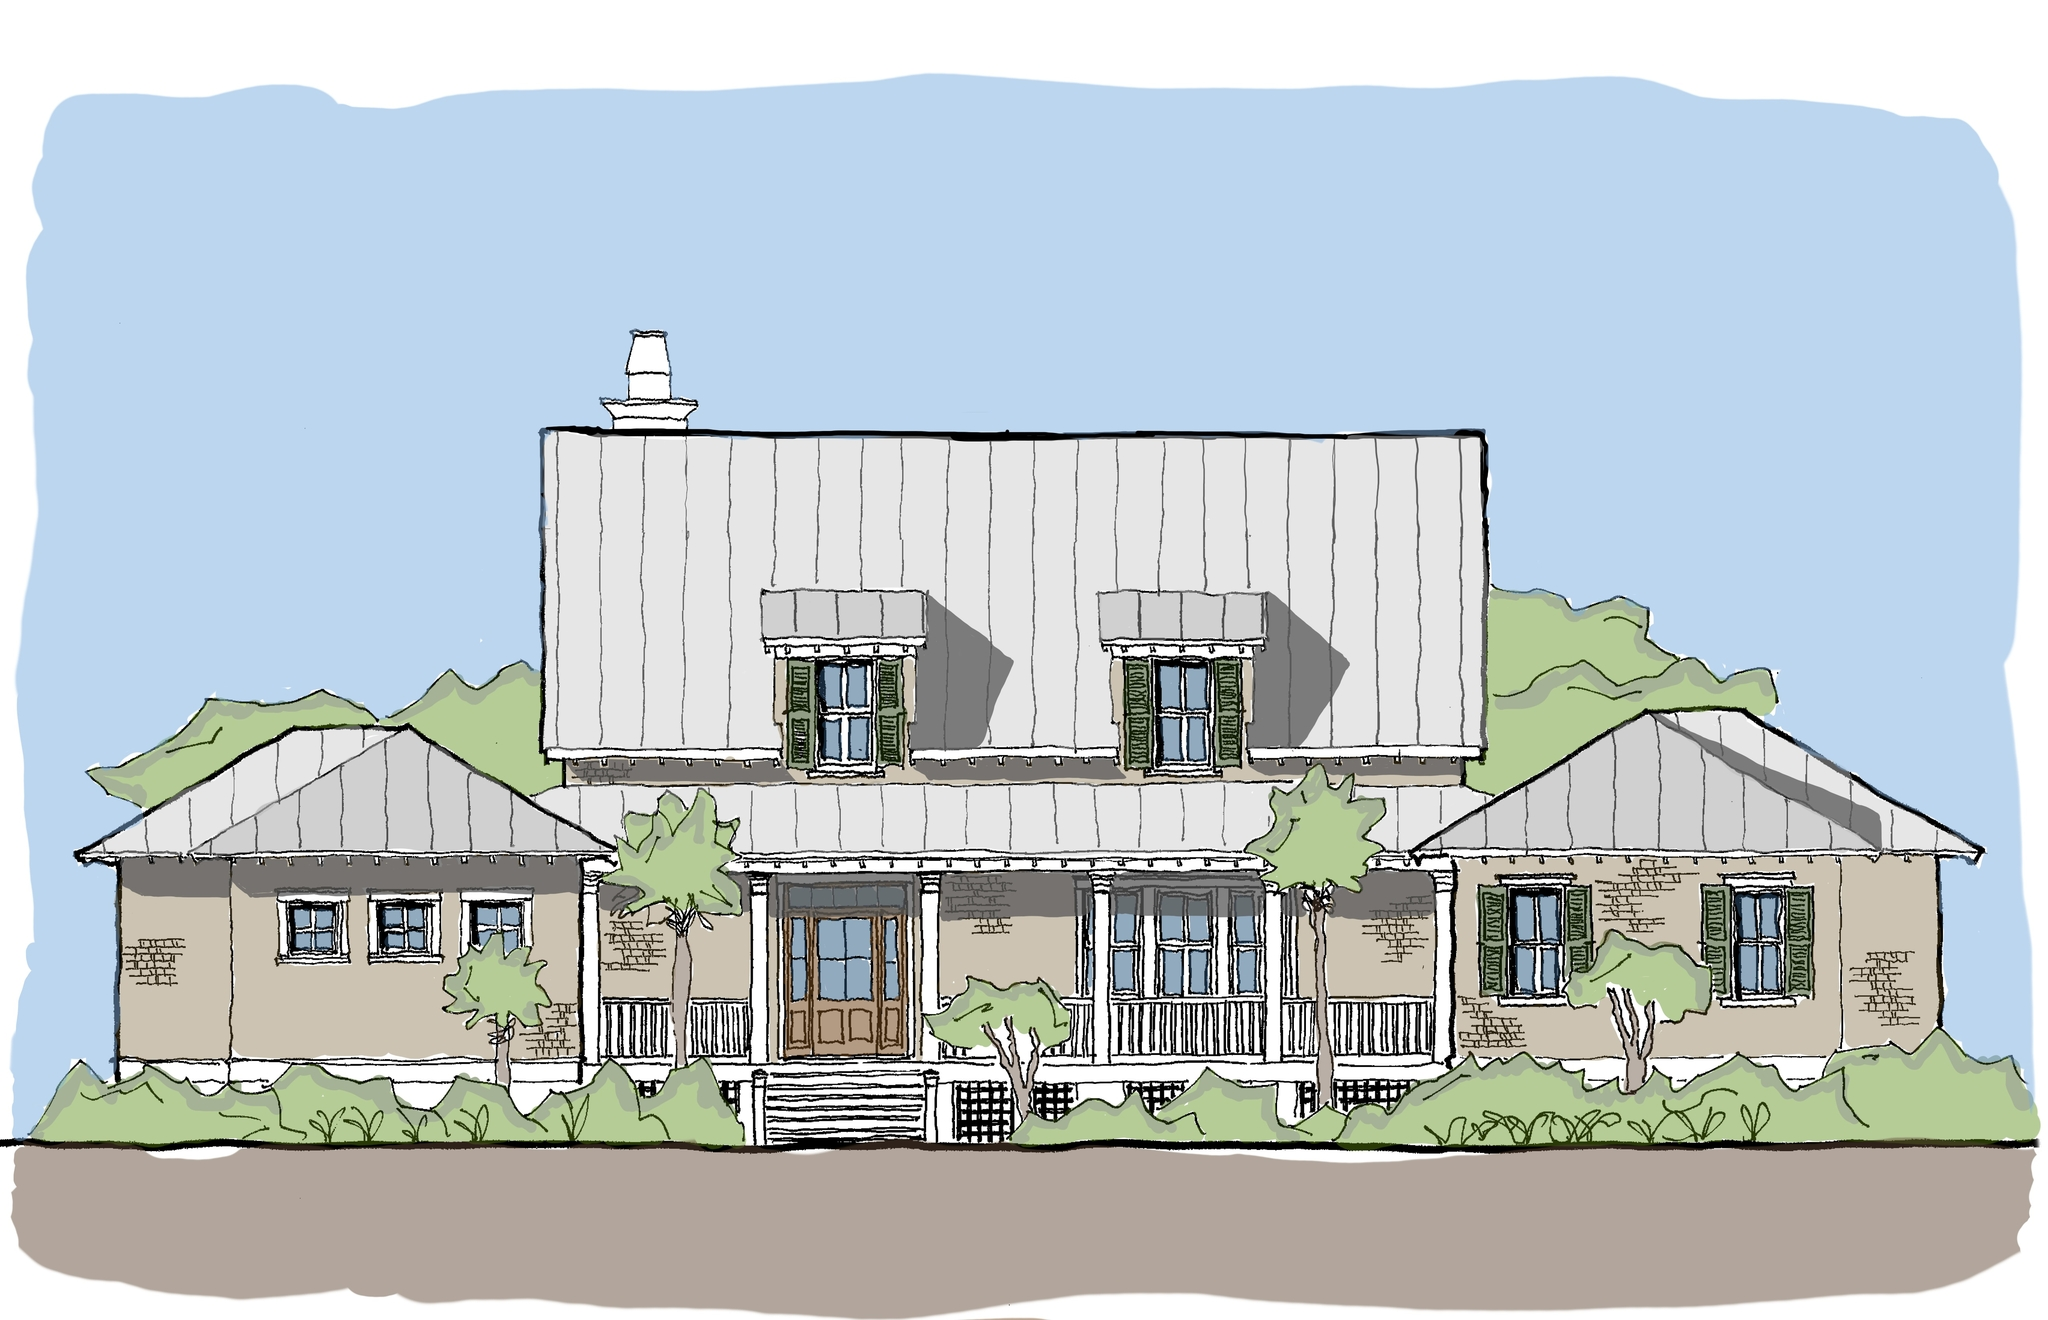 saltwater rest u2014 flatfish island designs u2014 coastal home plans